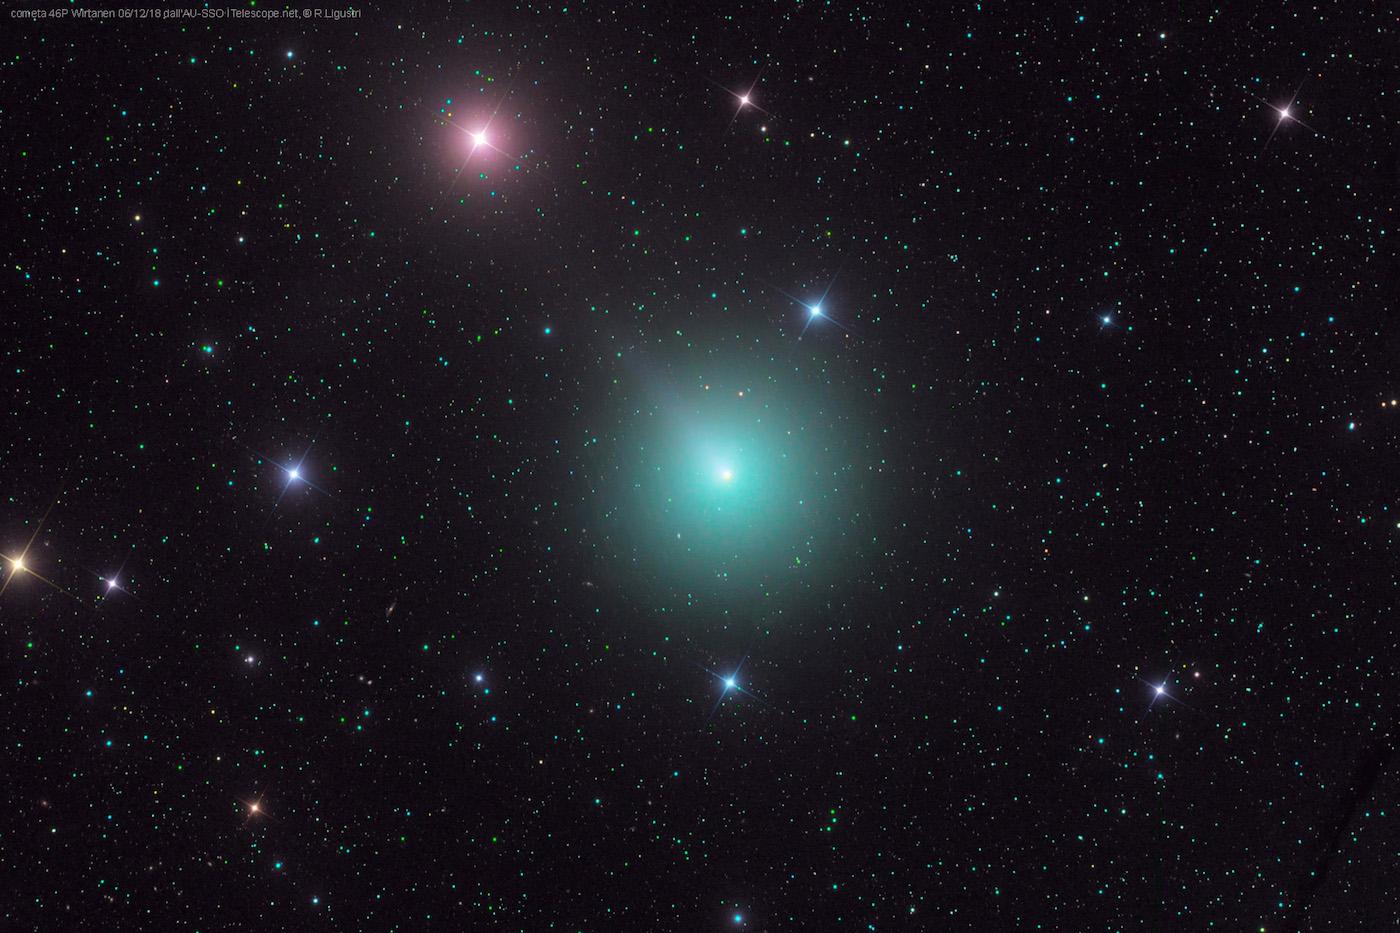 Imagen del Cometa 46P/Wirtanen tomada el 6 de diciembre